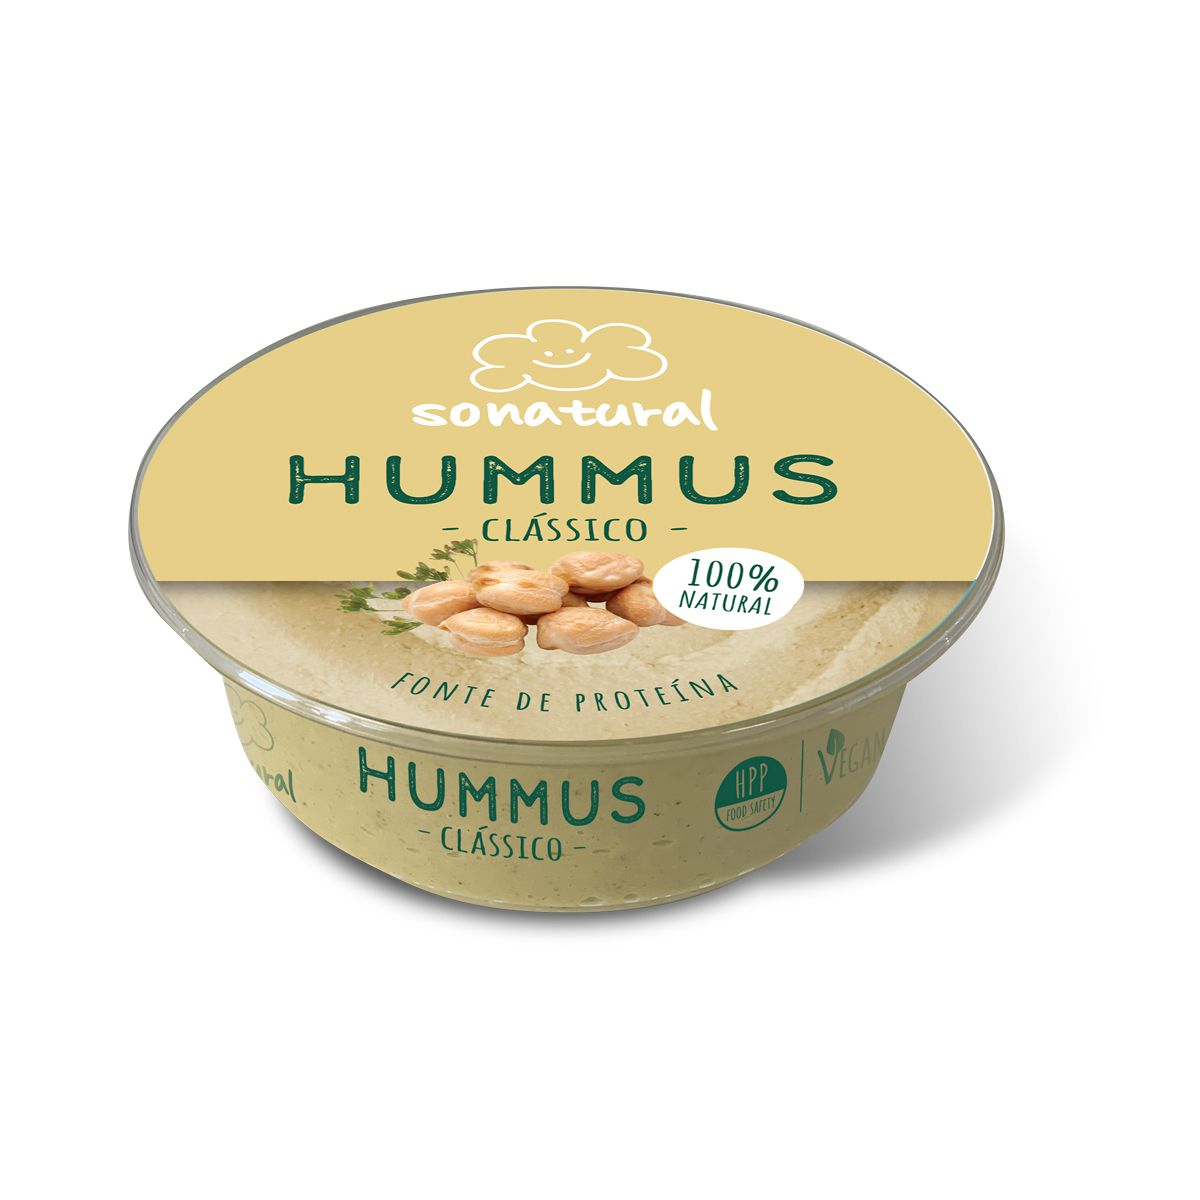 Sonatural Hummus Clássico 200gr